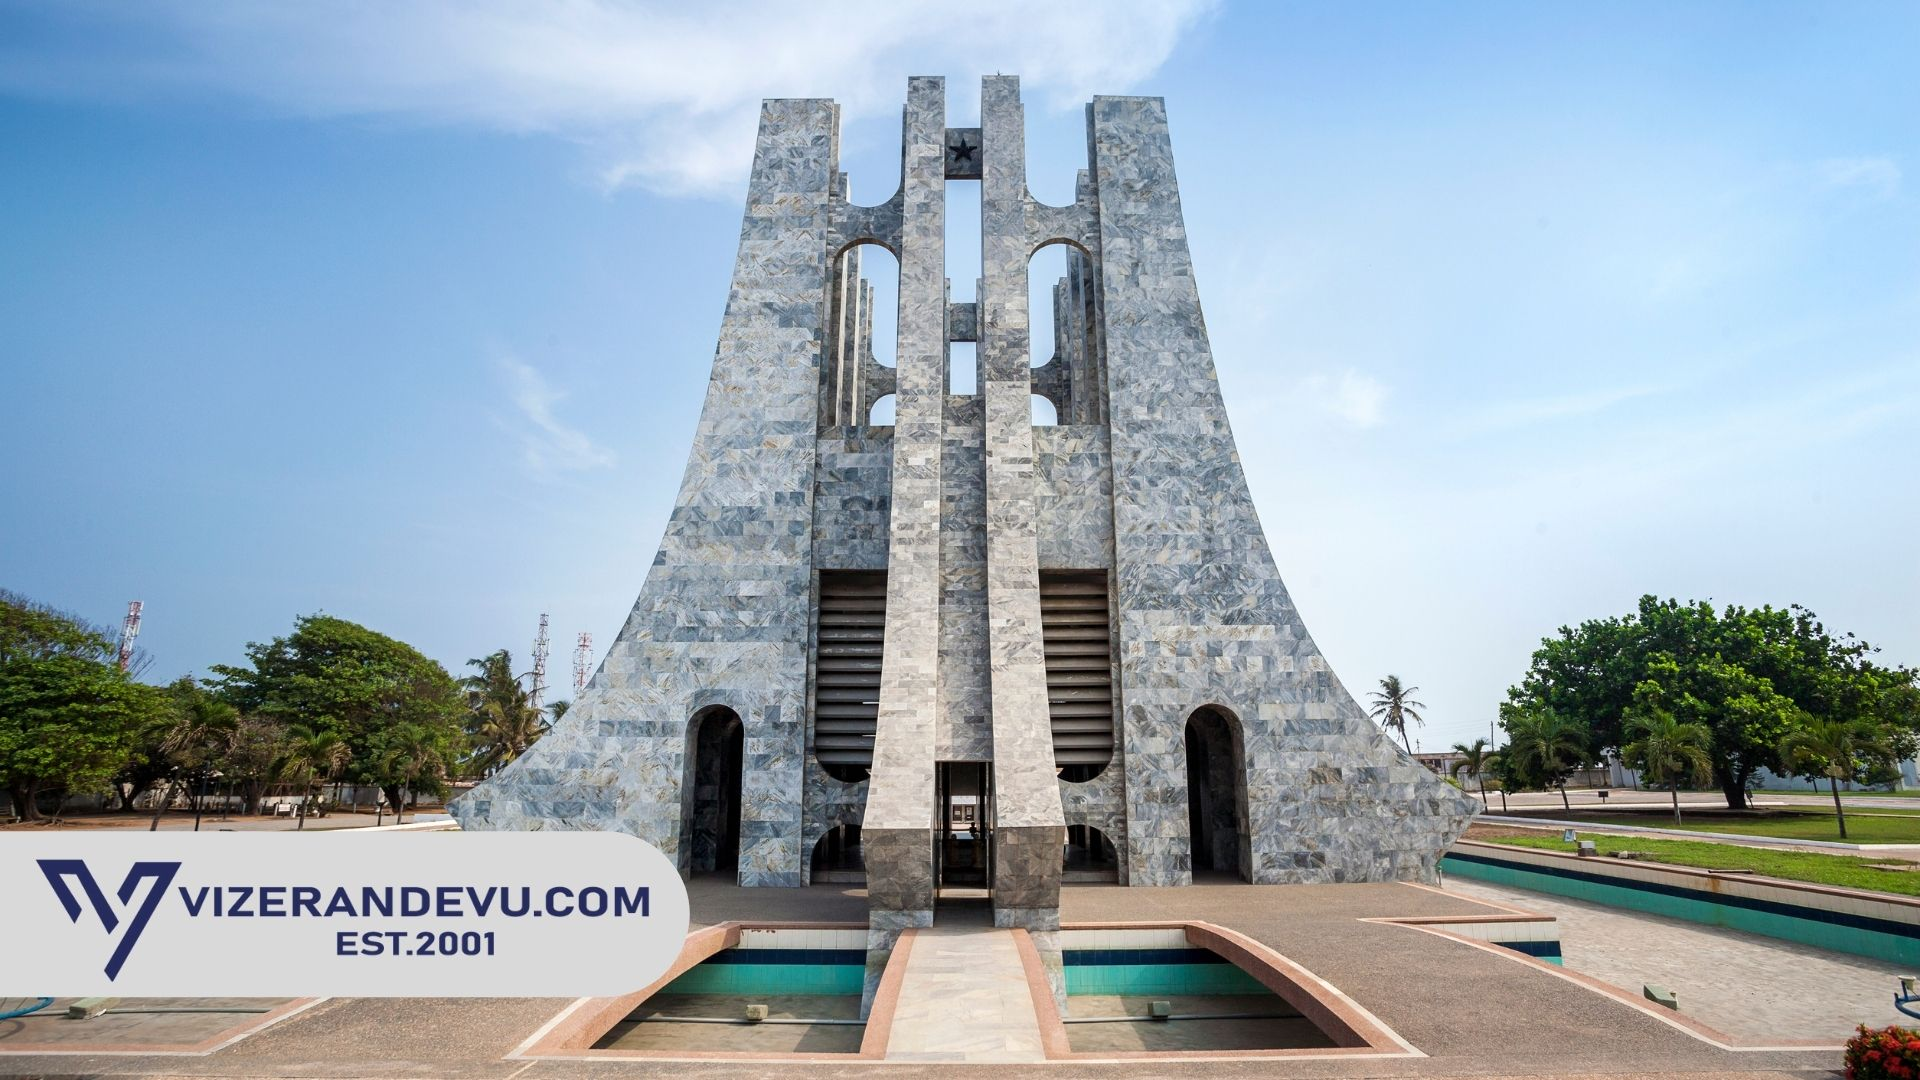 Gana Vizesi: Randevu ve Başvuru (2021)